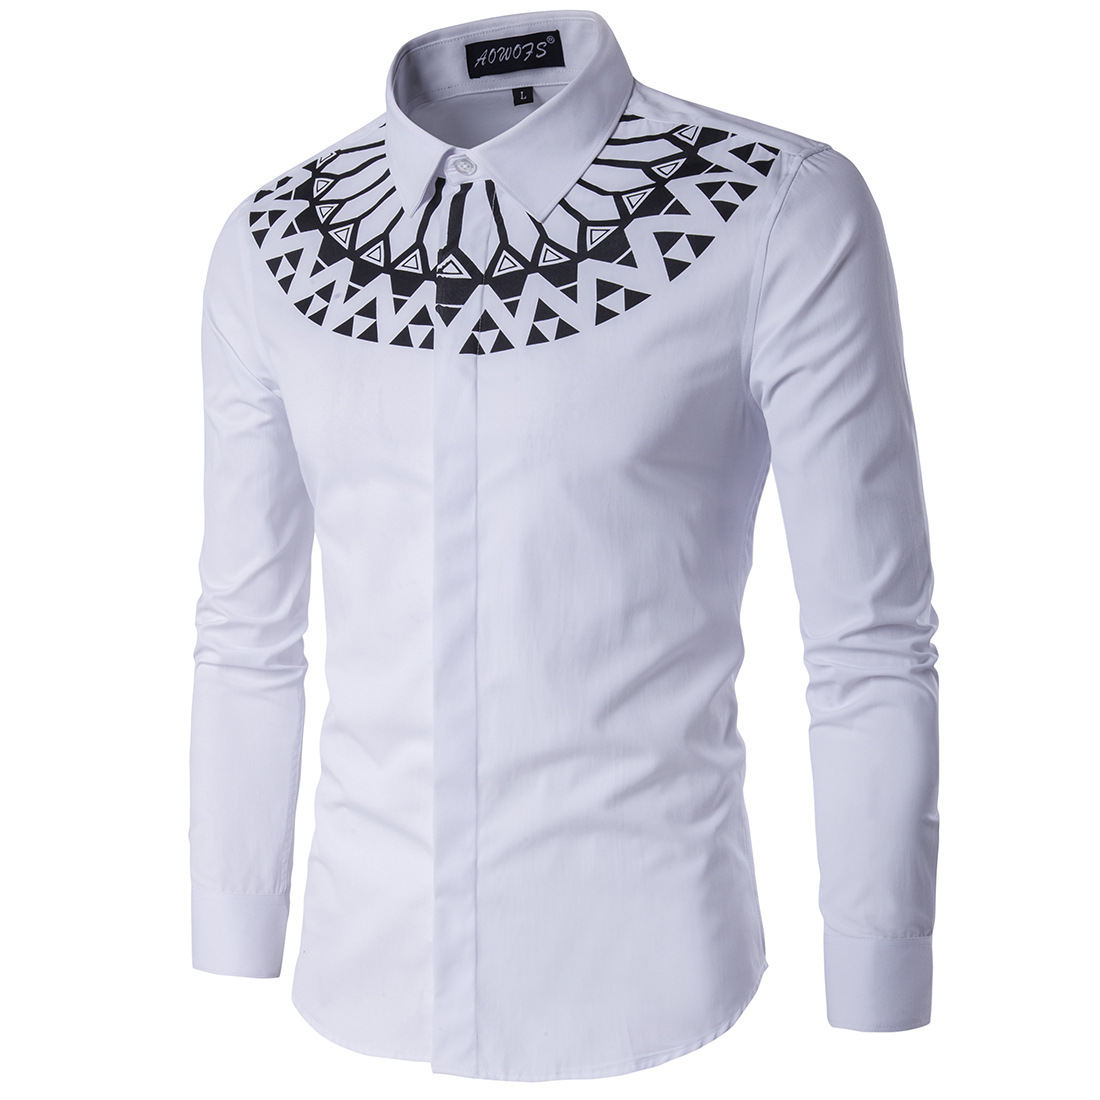 Мужская рубашка с орнаментом Slim Fit 3451710890_944273139.jpg